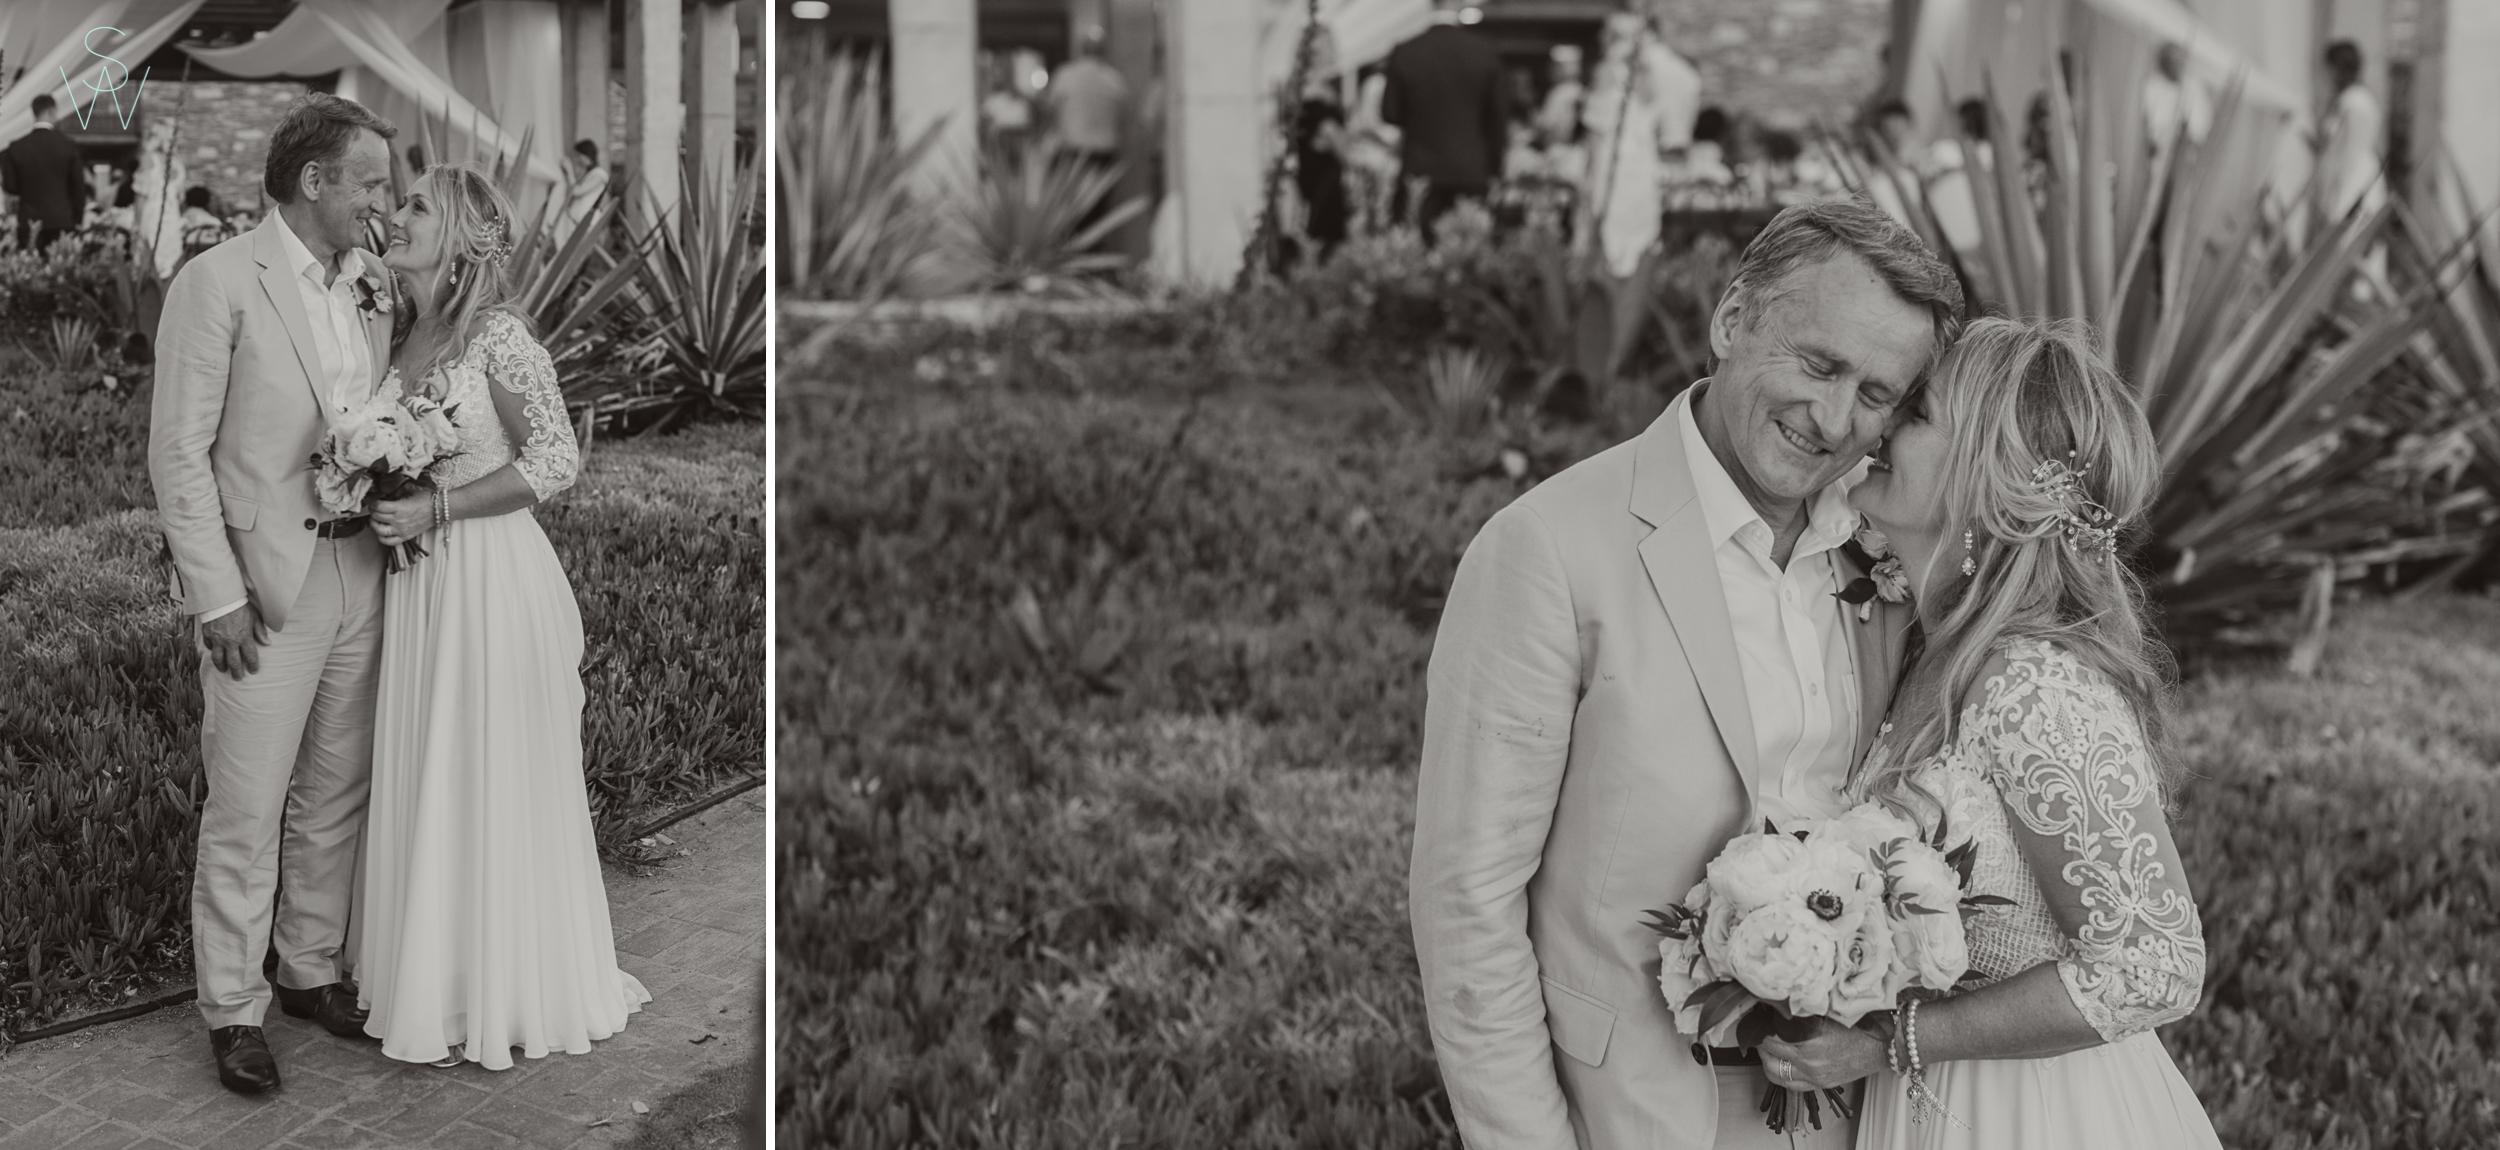 162DEL.MAR.WEDDINGS.photography.shewanders.JPG